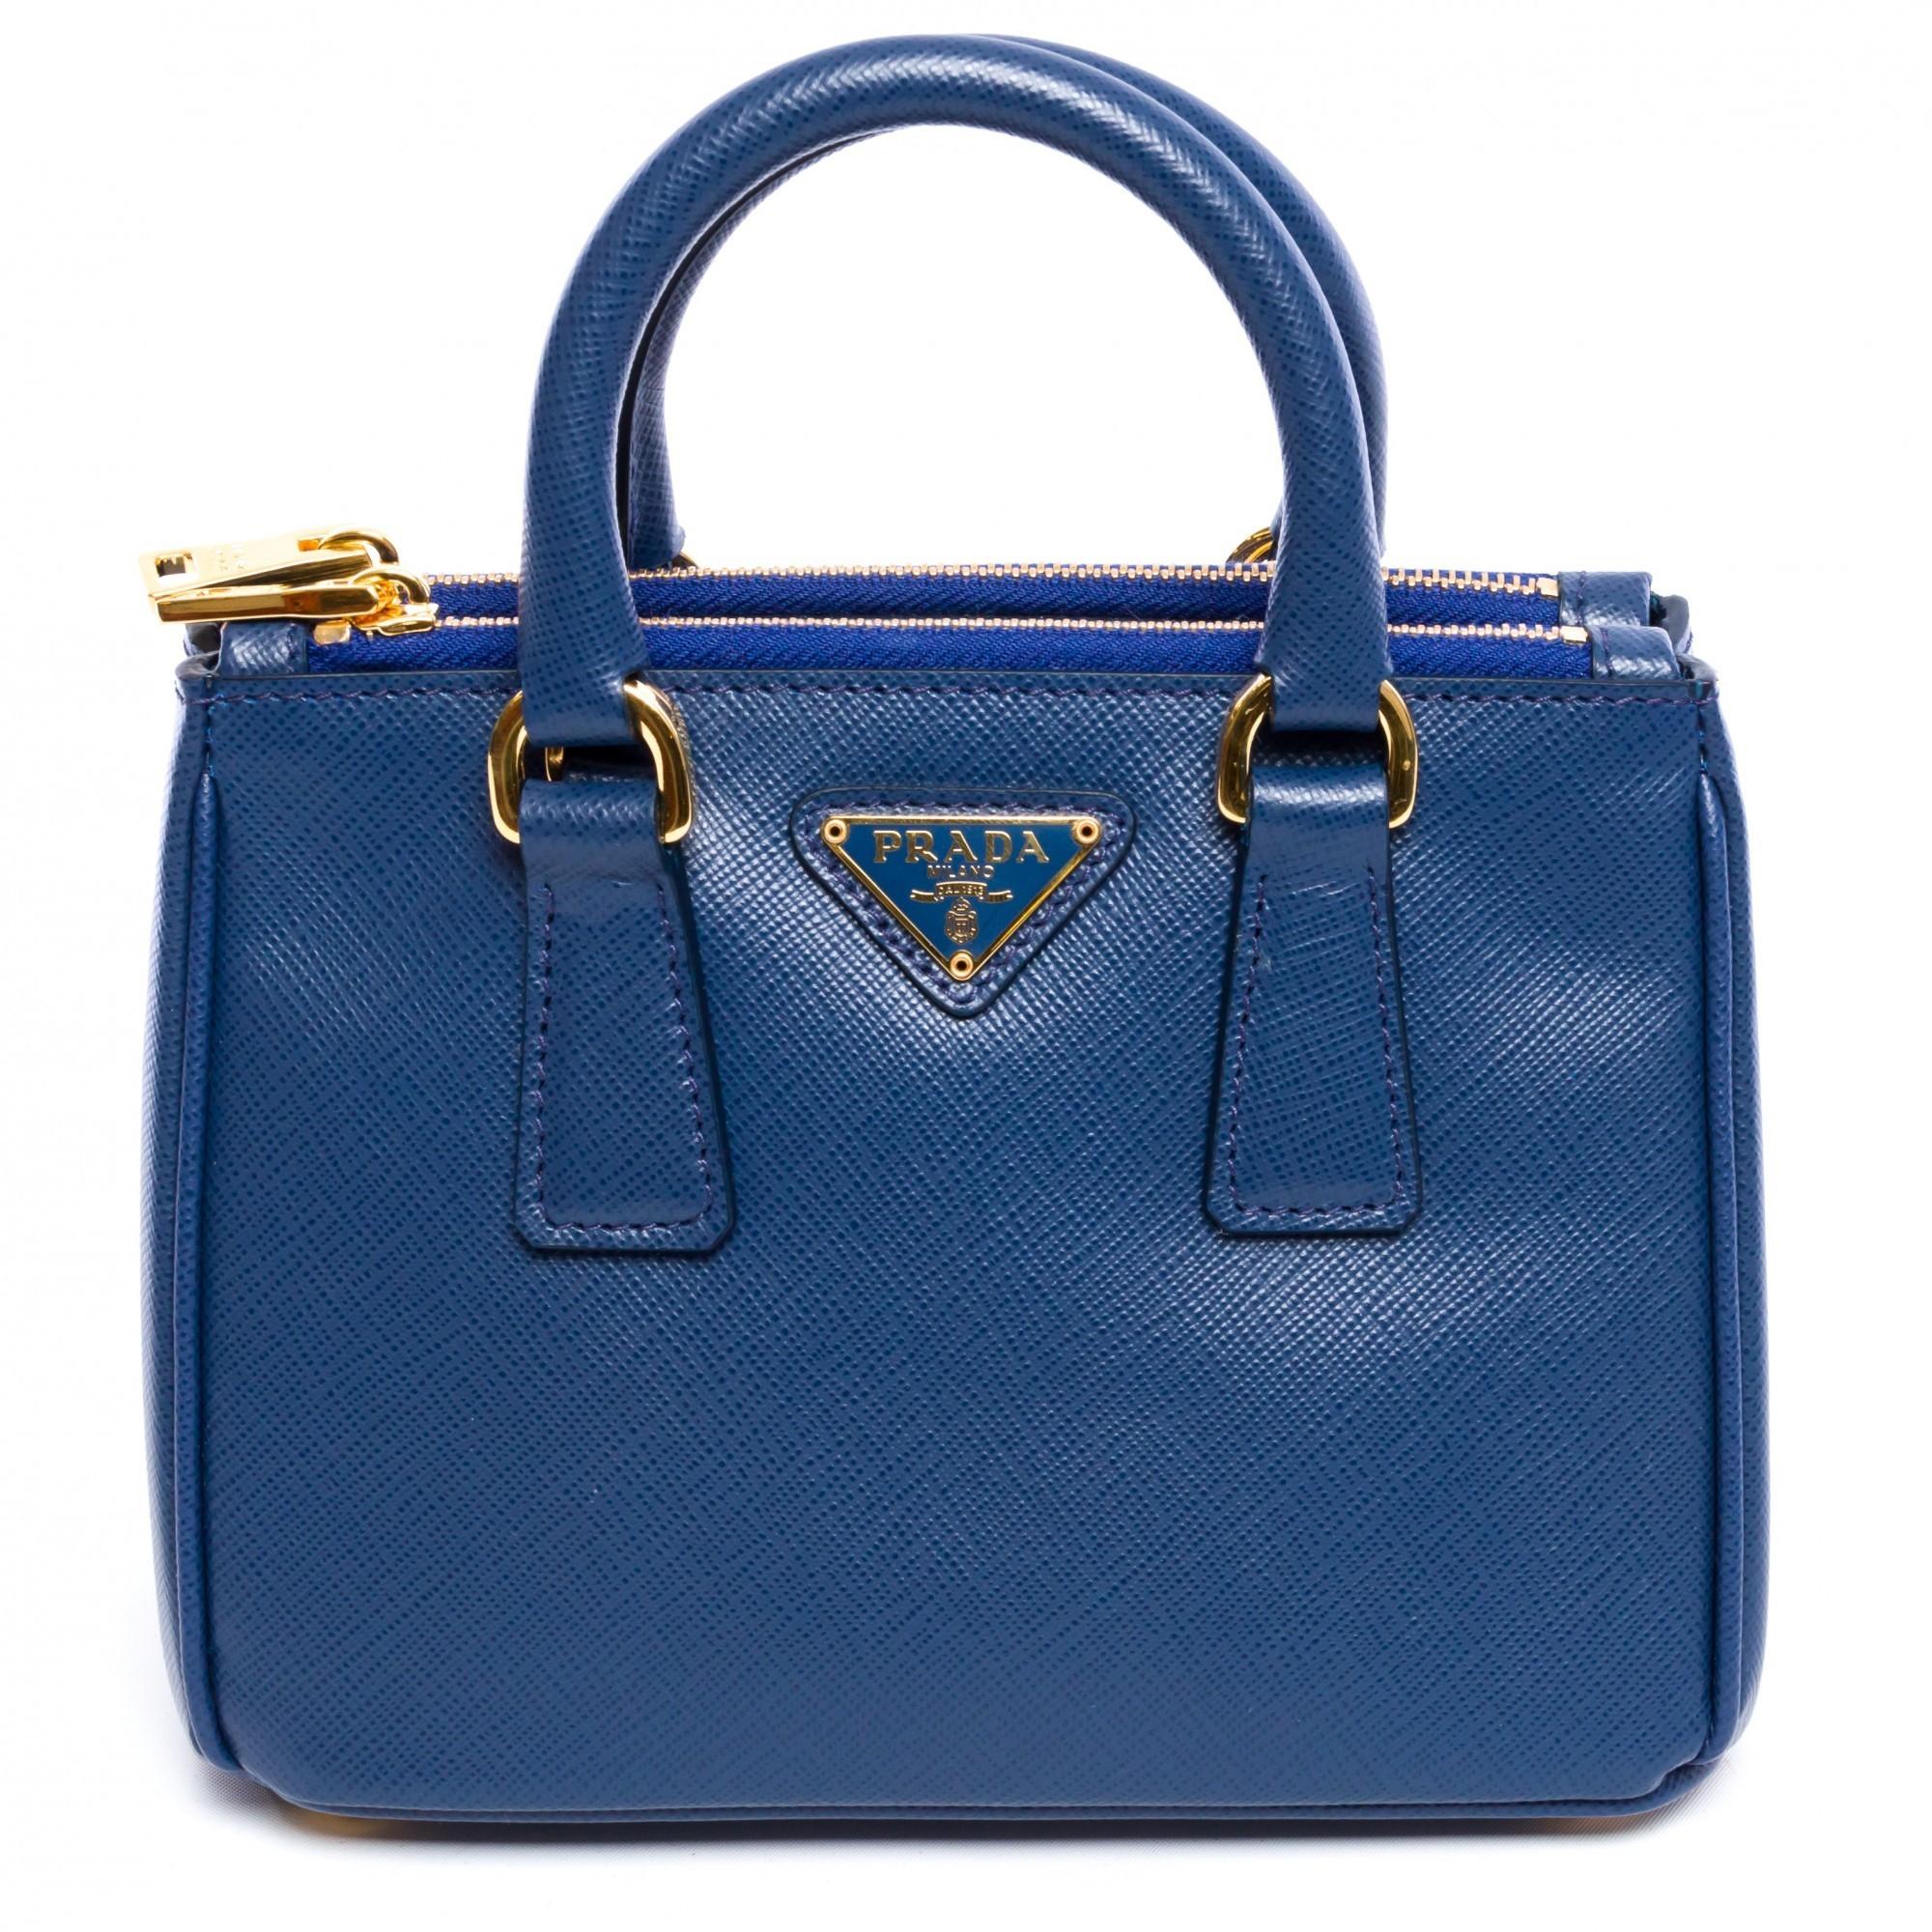 prada bags sale online - Prada Saffiano Mini Galleria 1BH907 Bluette Saffiano Blue Leather ...